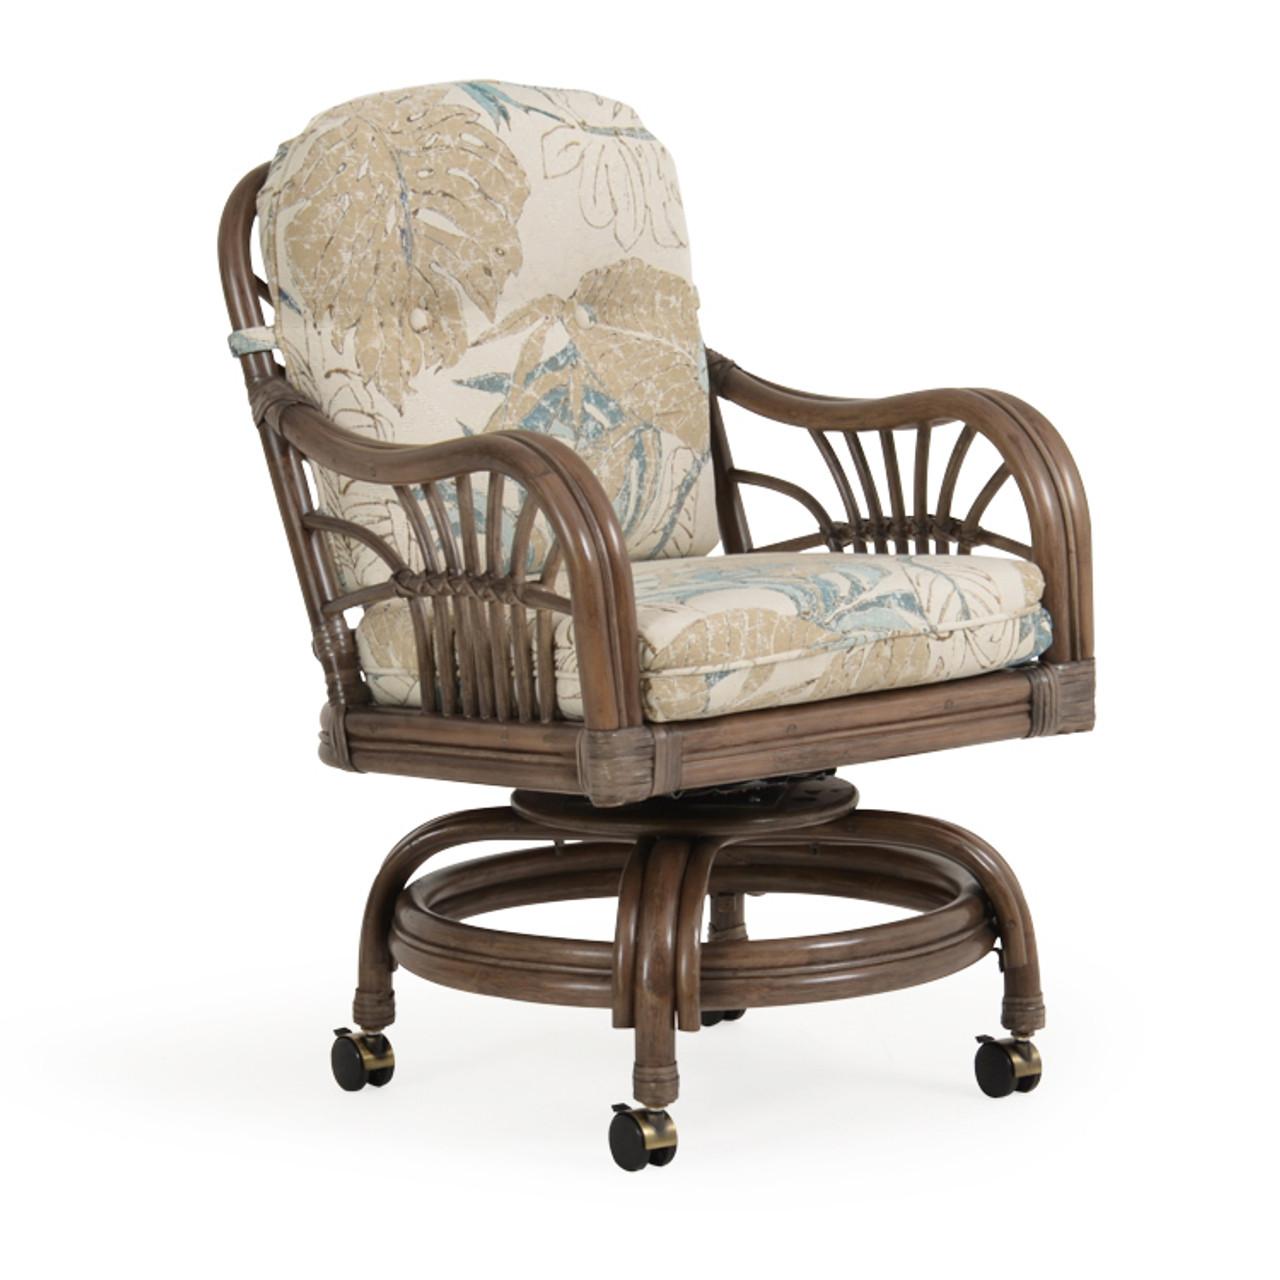 Islamorada Indoor Rattan Swivel Tilt Caster Dining Chair